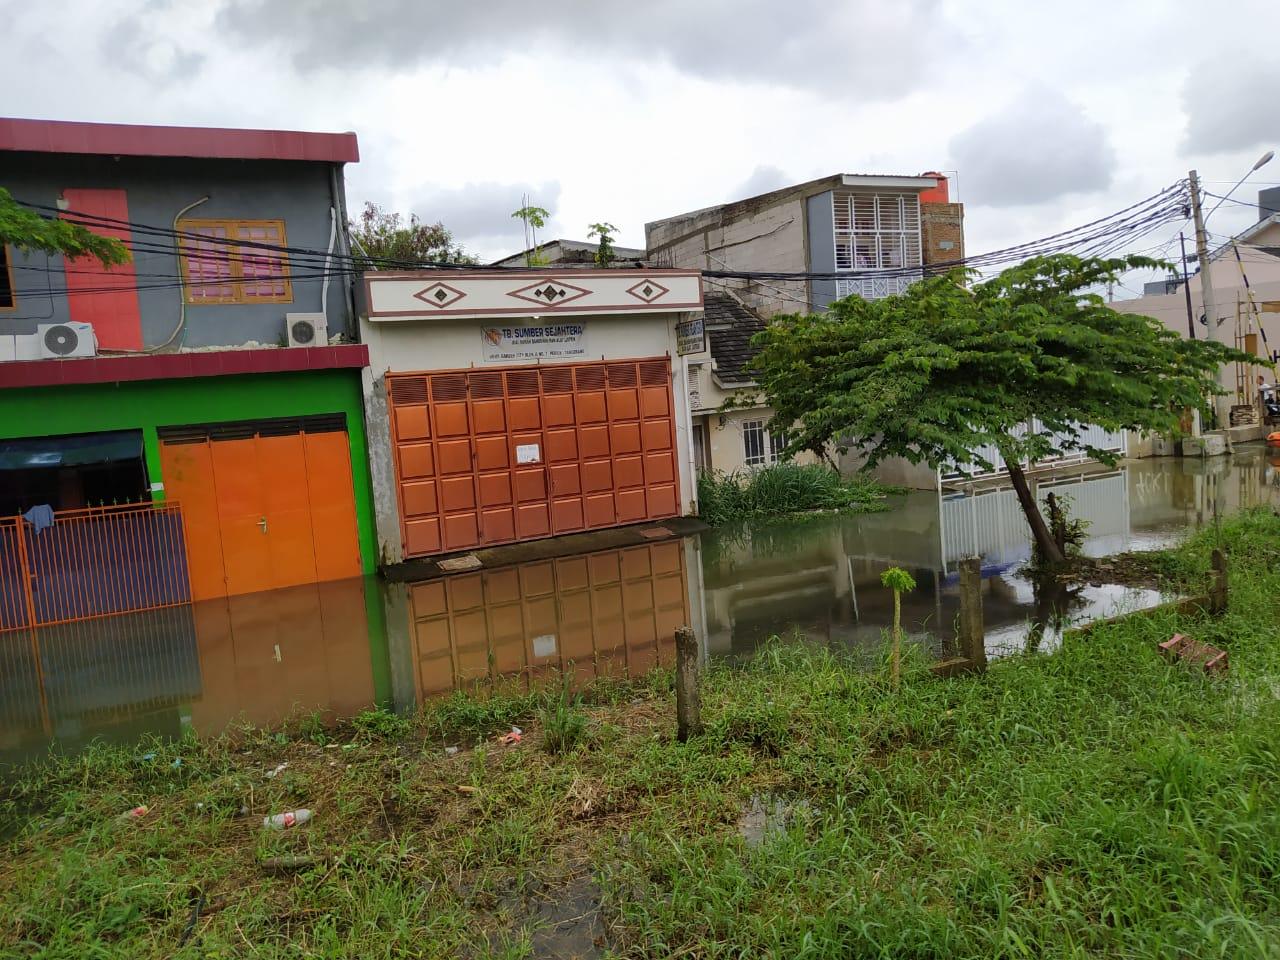 Sasana wilayah Kecamatan Periuk di Kota Tangerang masih tergenang air, Jumat (19/2/2021).